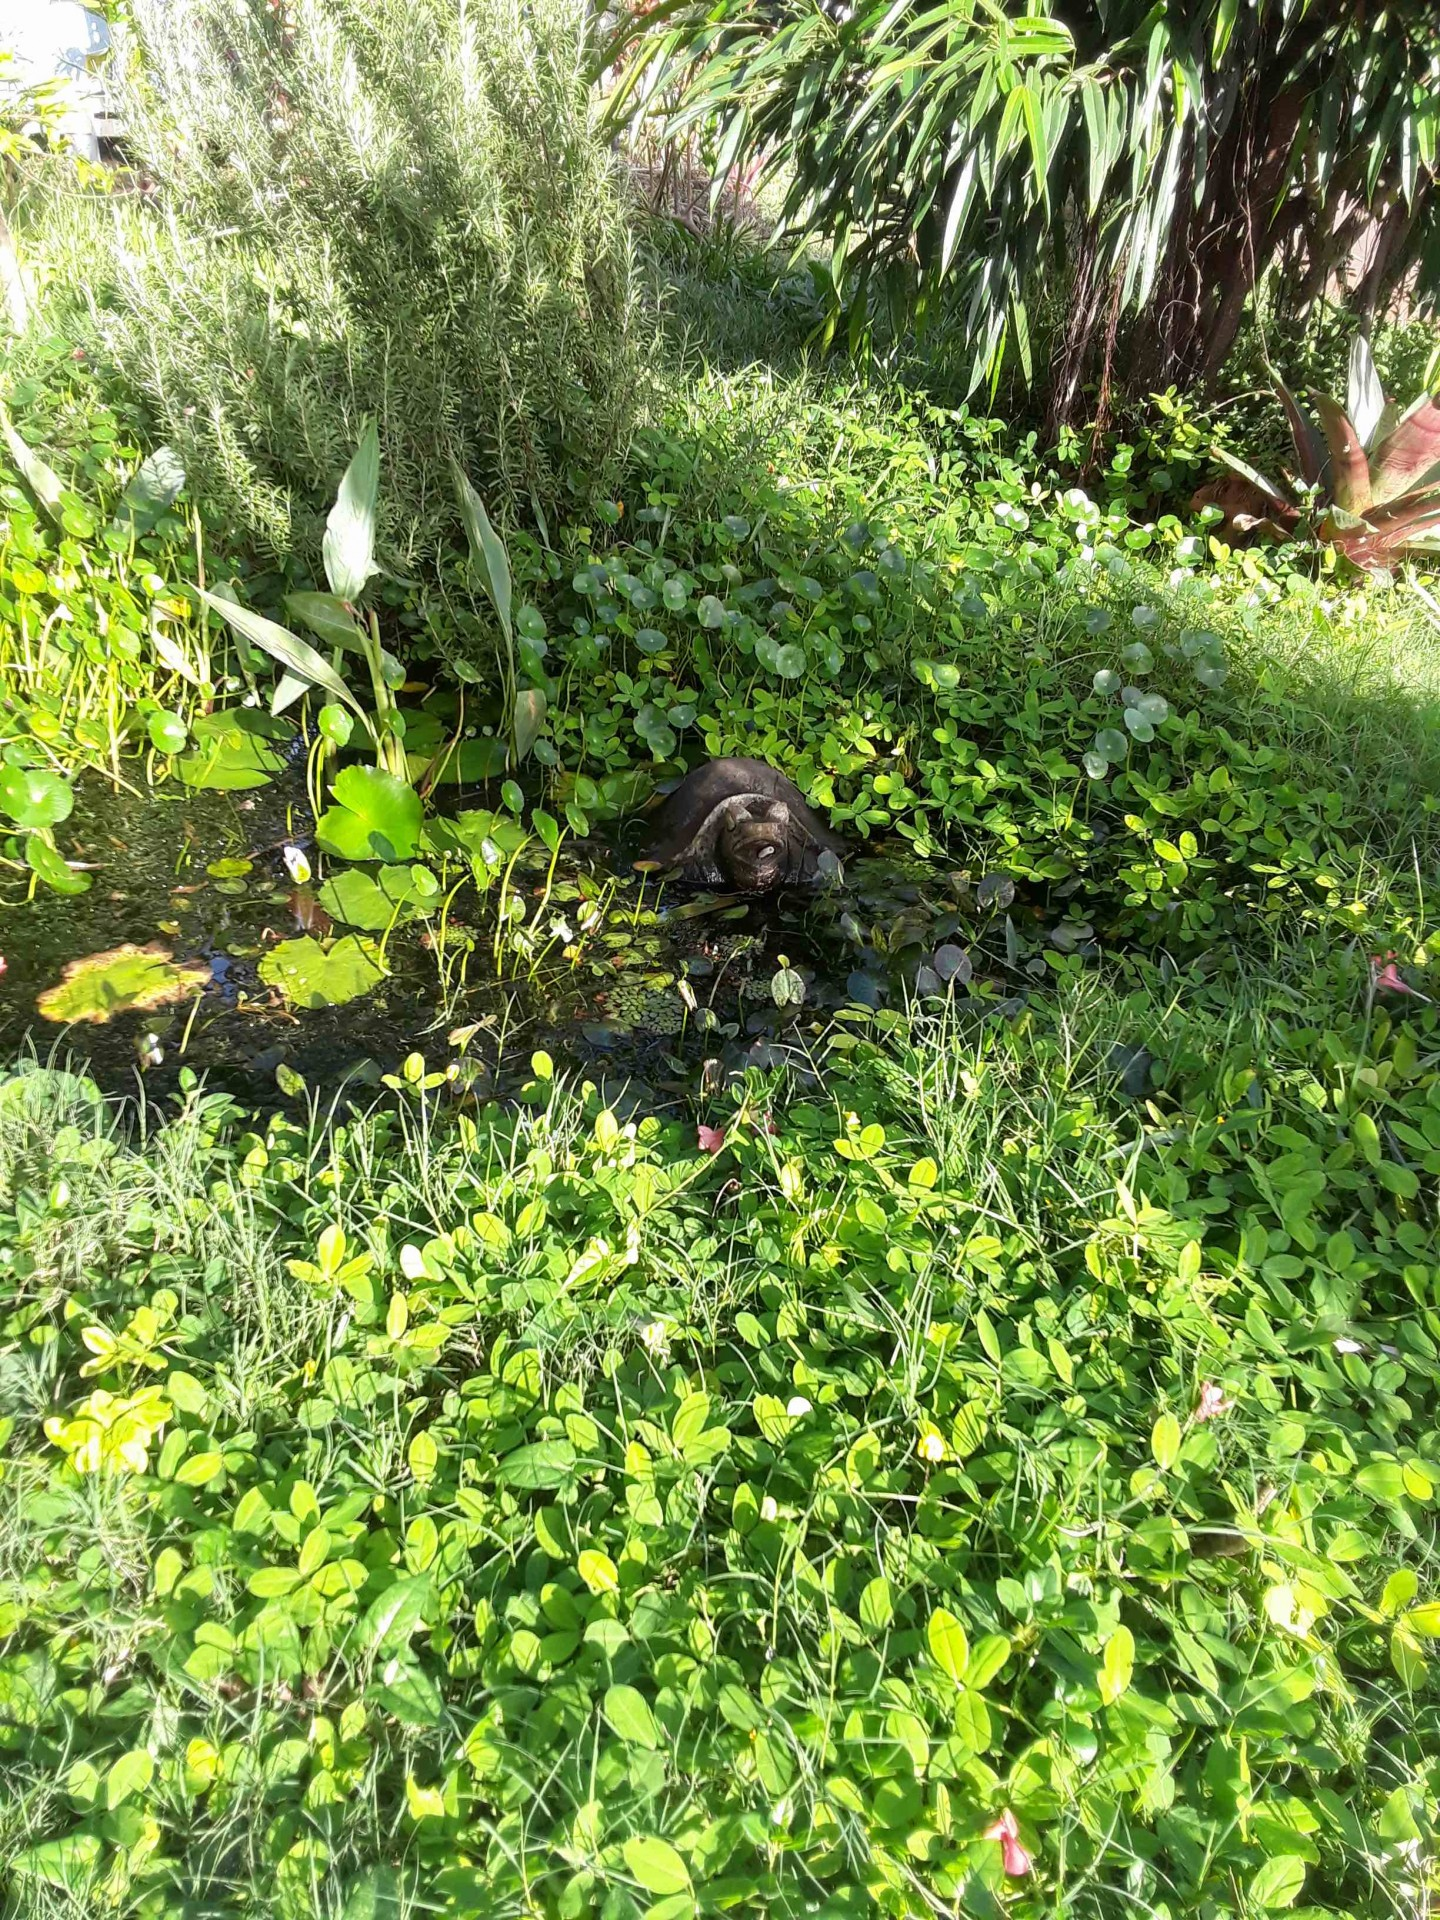 Ocean Friendly Gardens spreading across Kaua'i - Surfrider